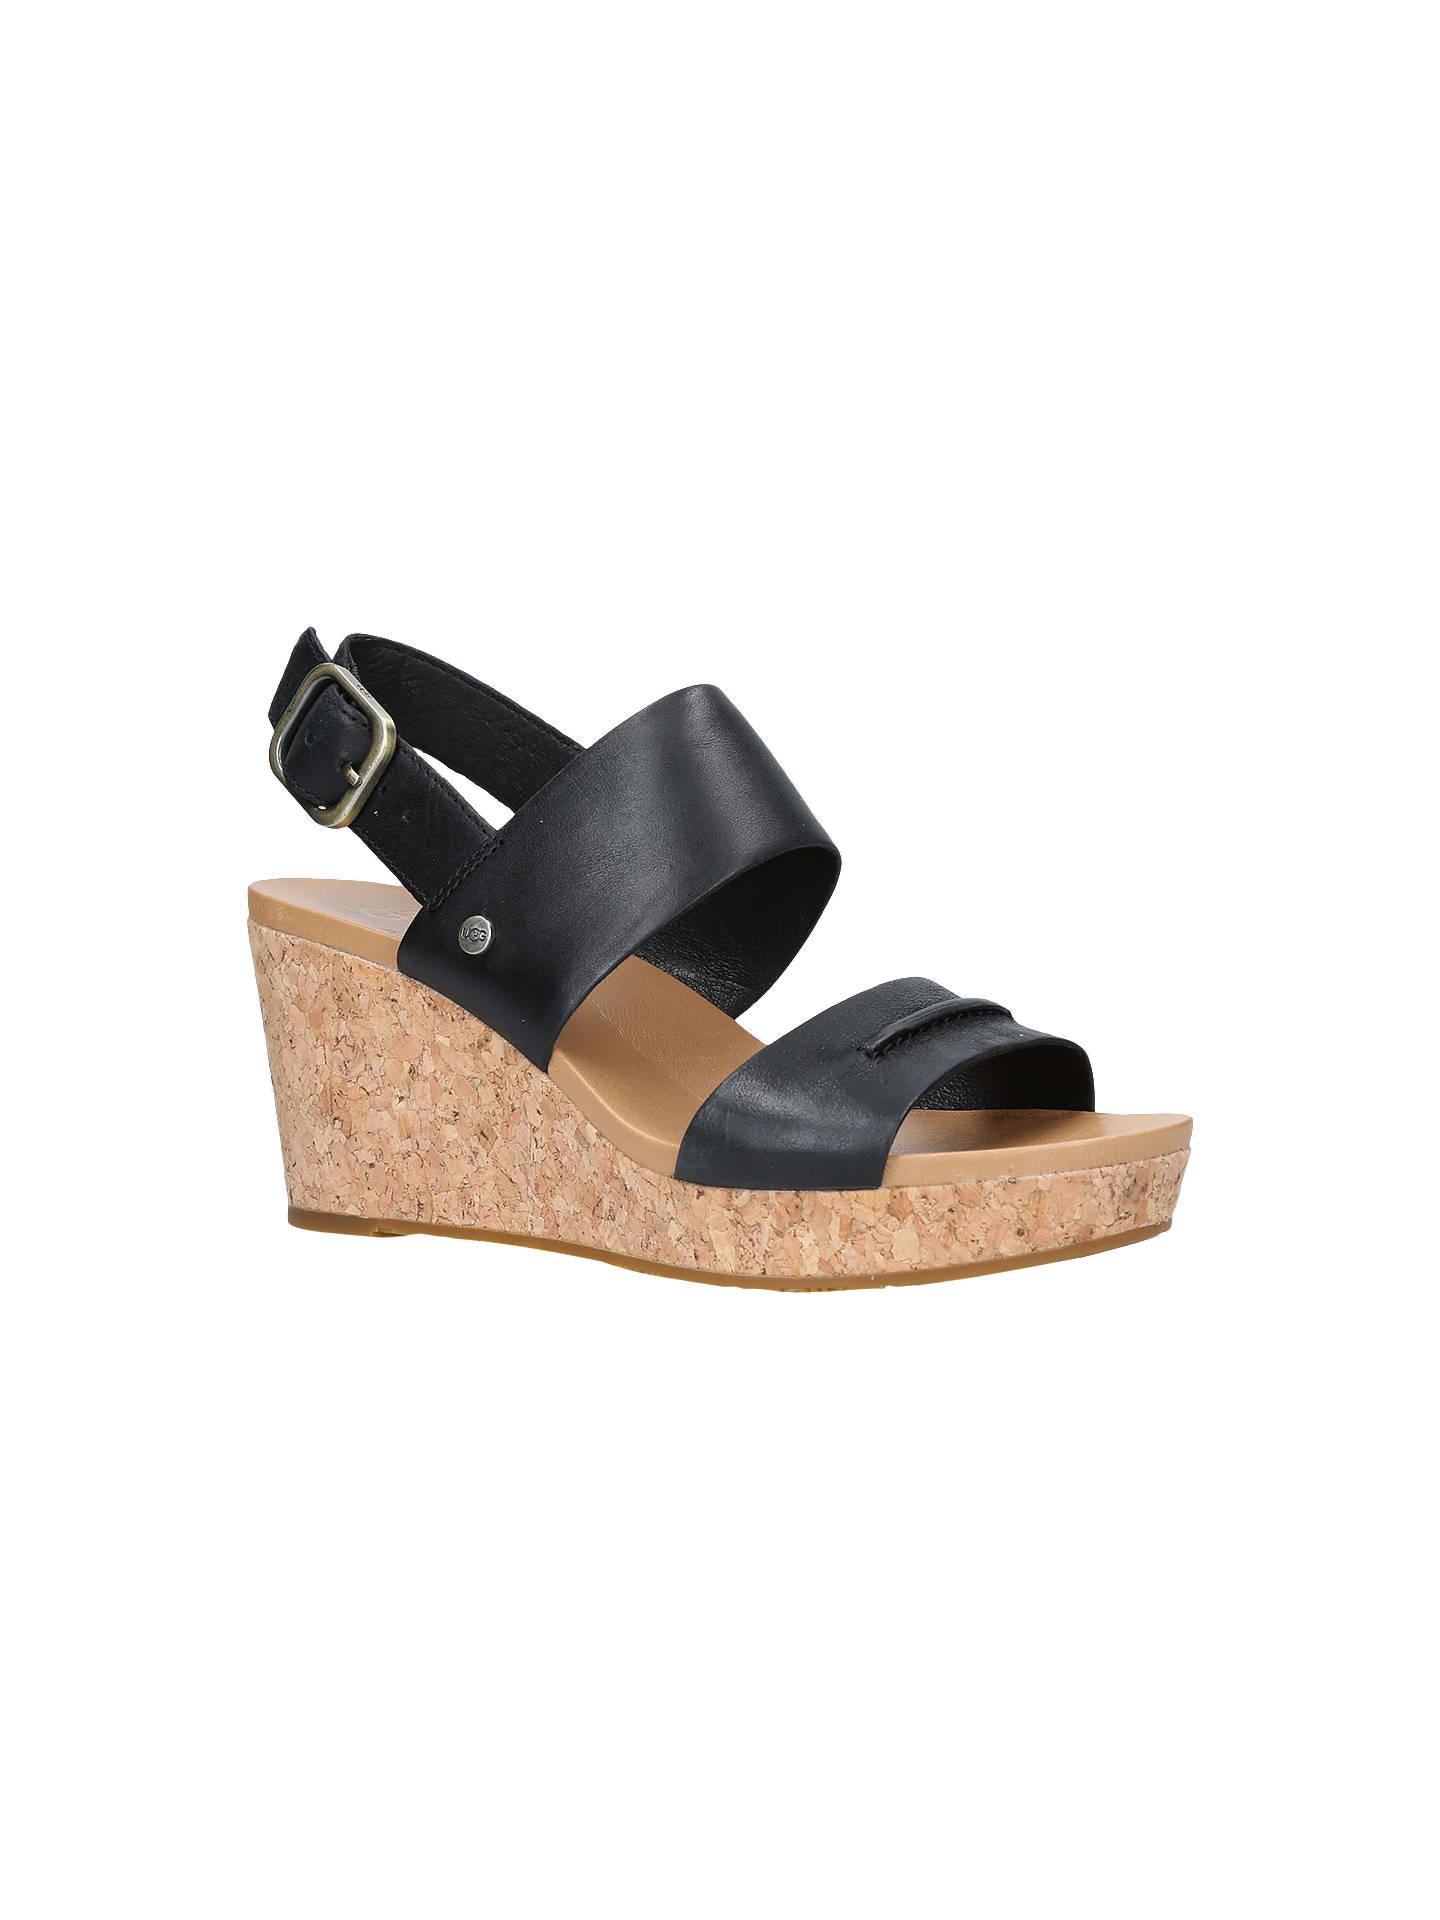 cc3d0f610b9 Buy UGG Elena II Wedge Heel Sandals